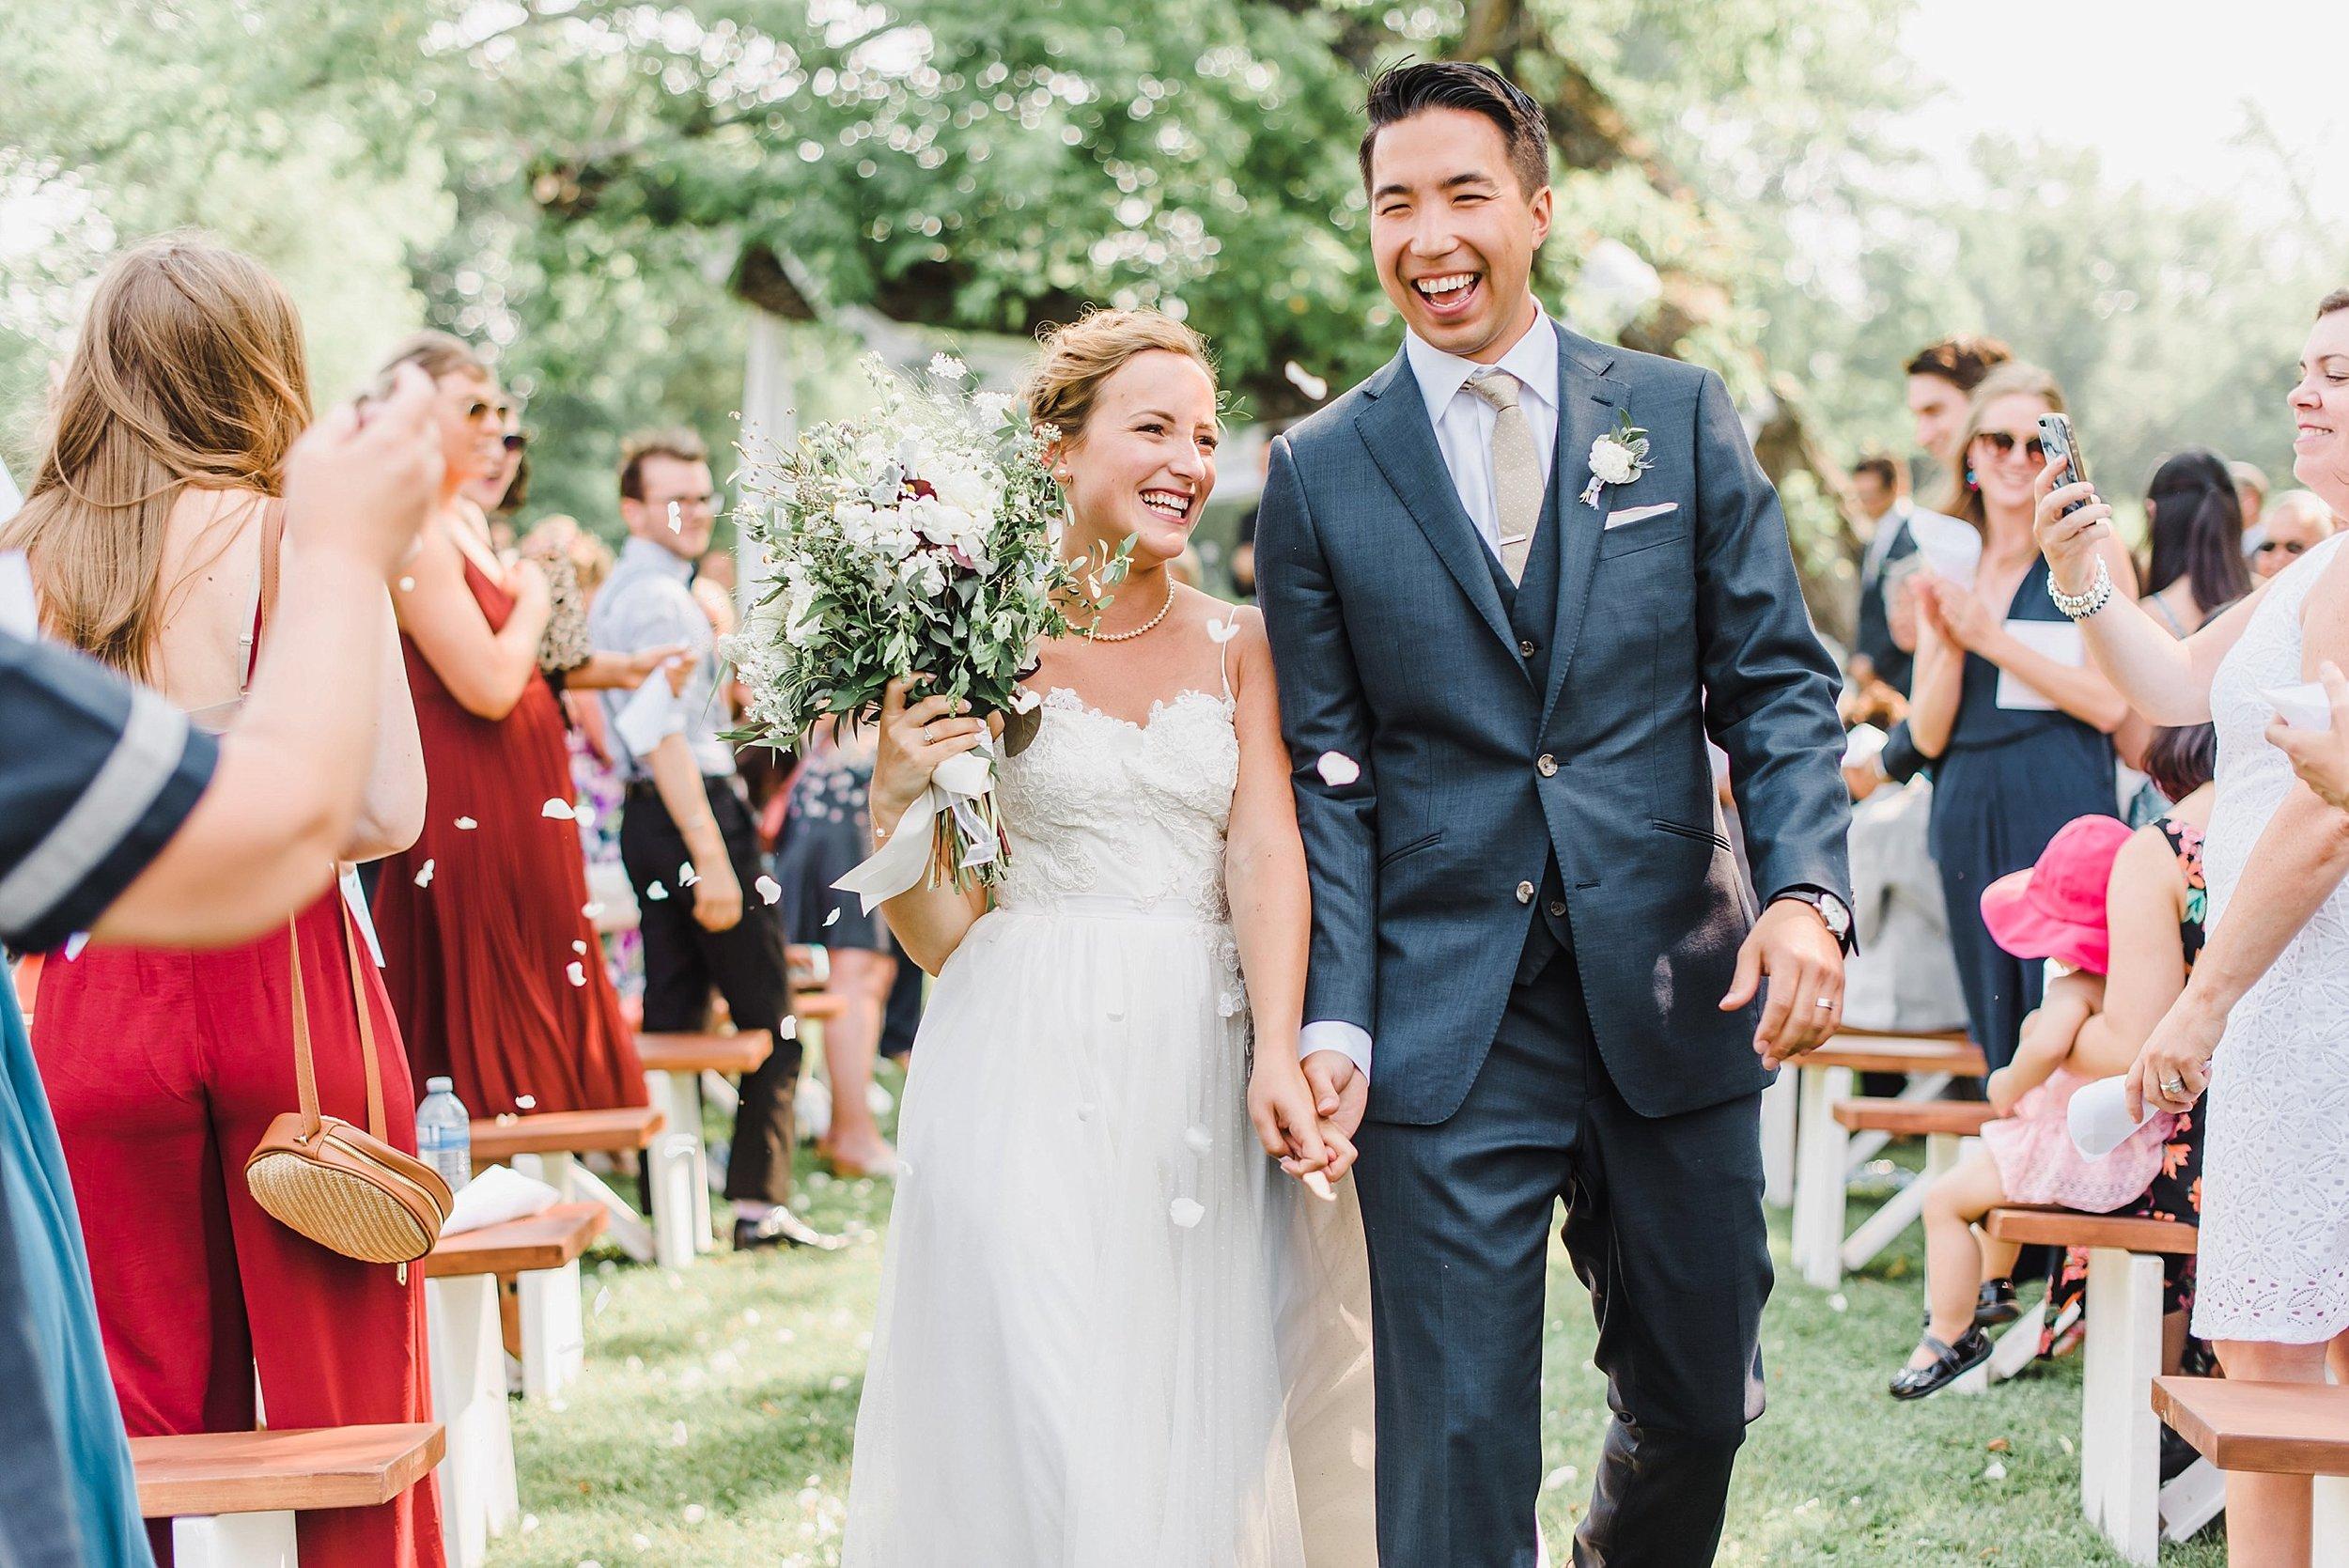 light airy indie fine art ottawa wedding photographer | Ali and Batoul Photography_0819.jpg